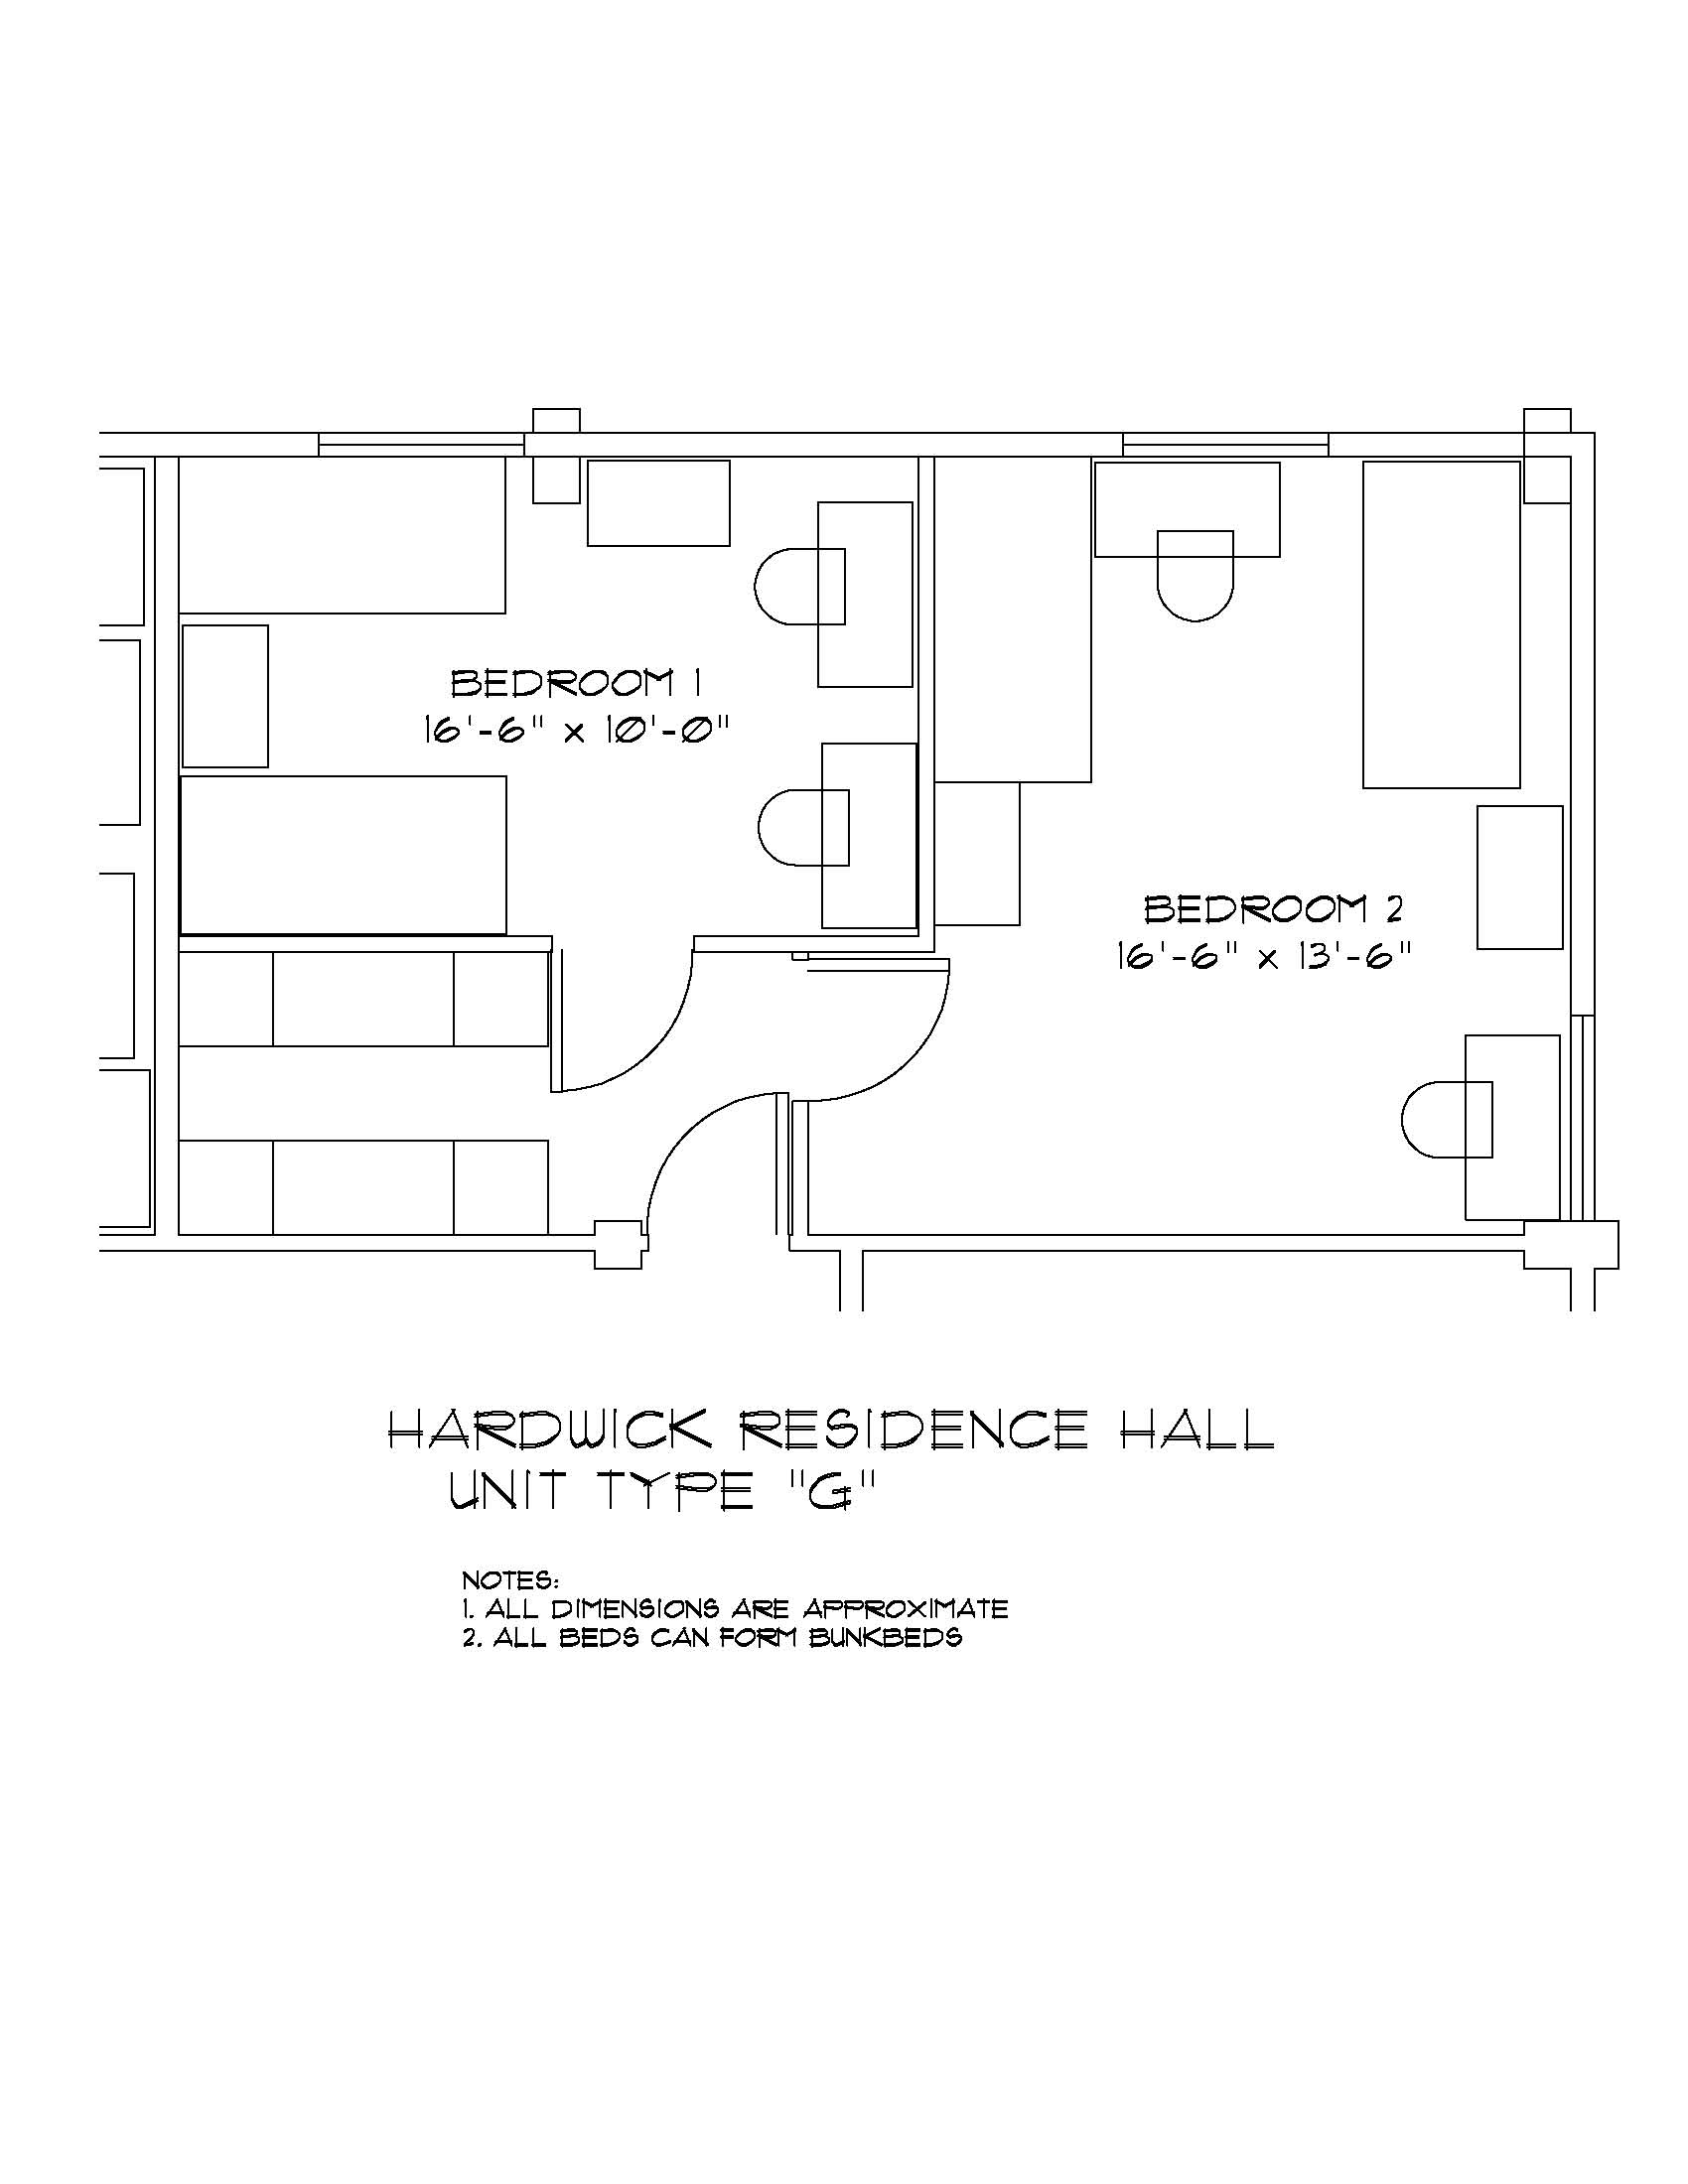 Hardwick Hall: Type G